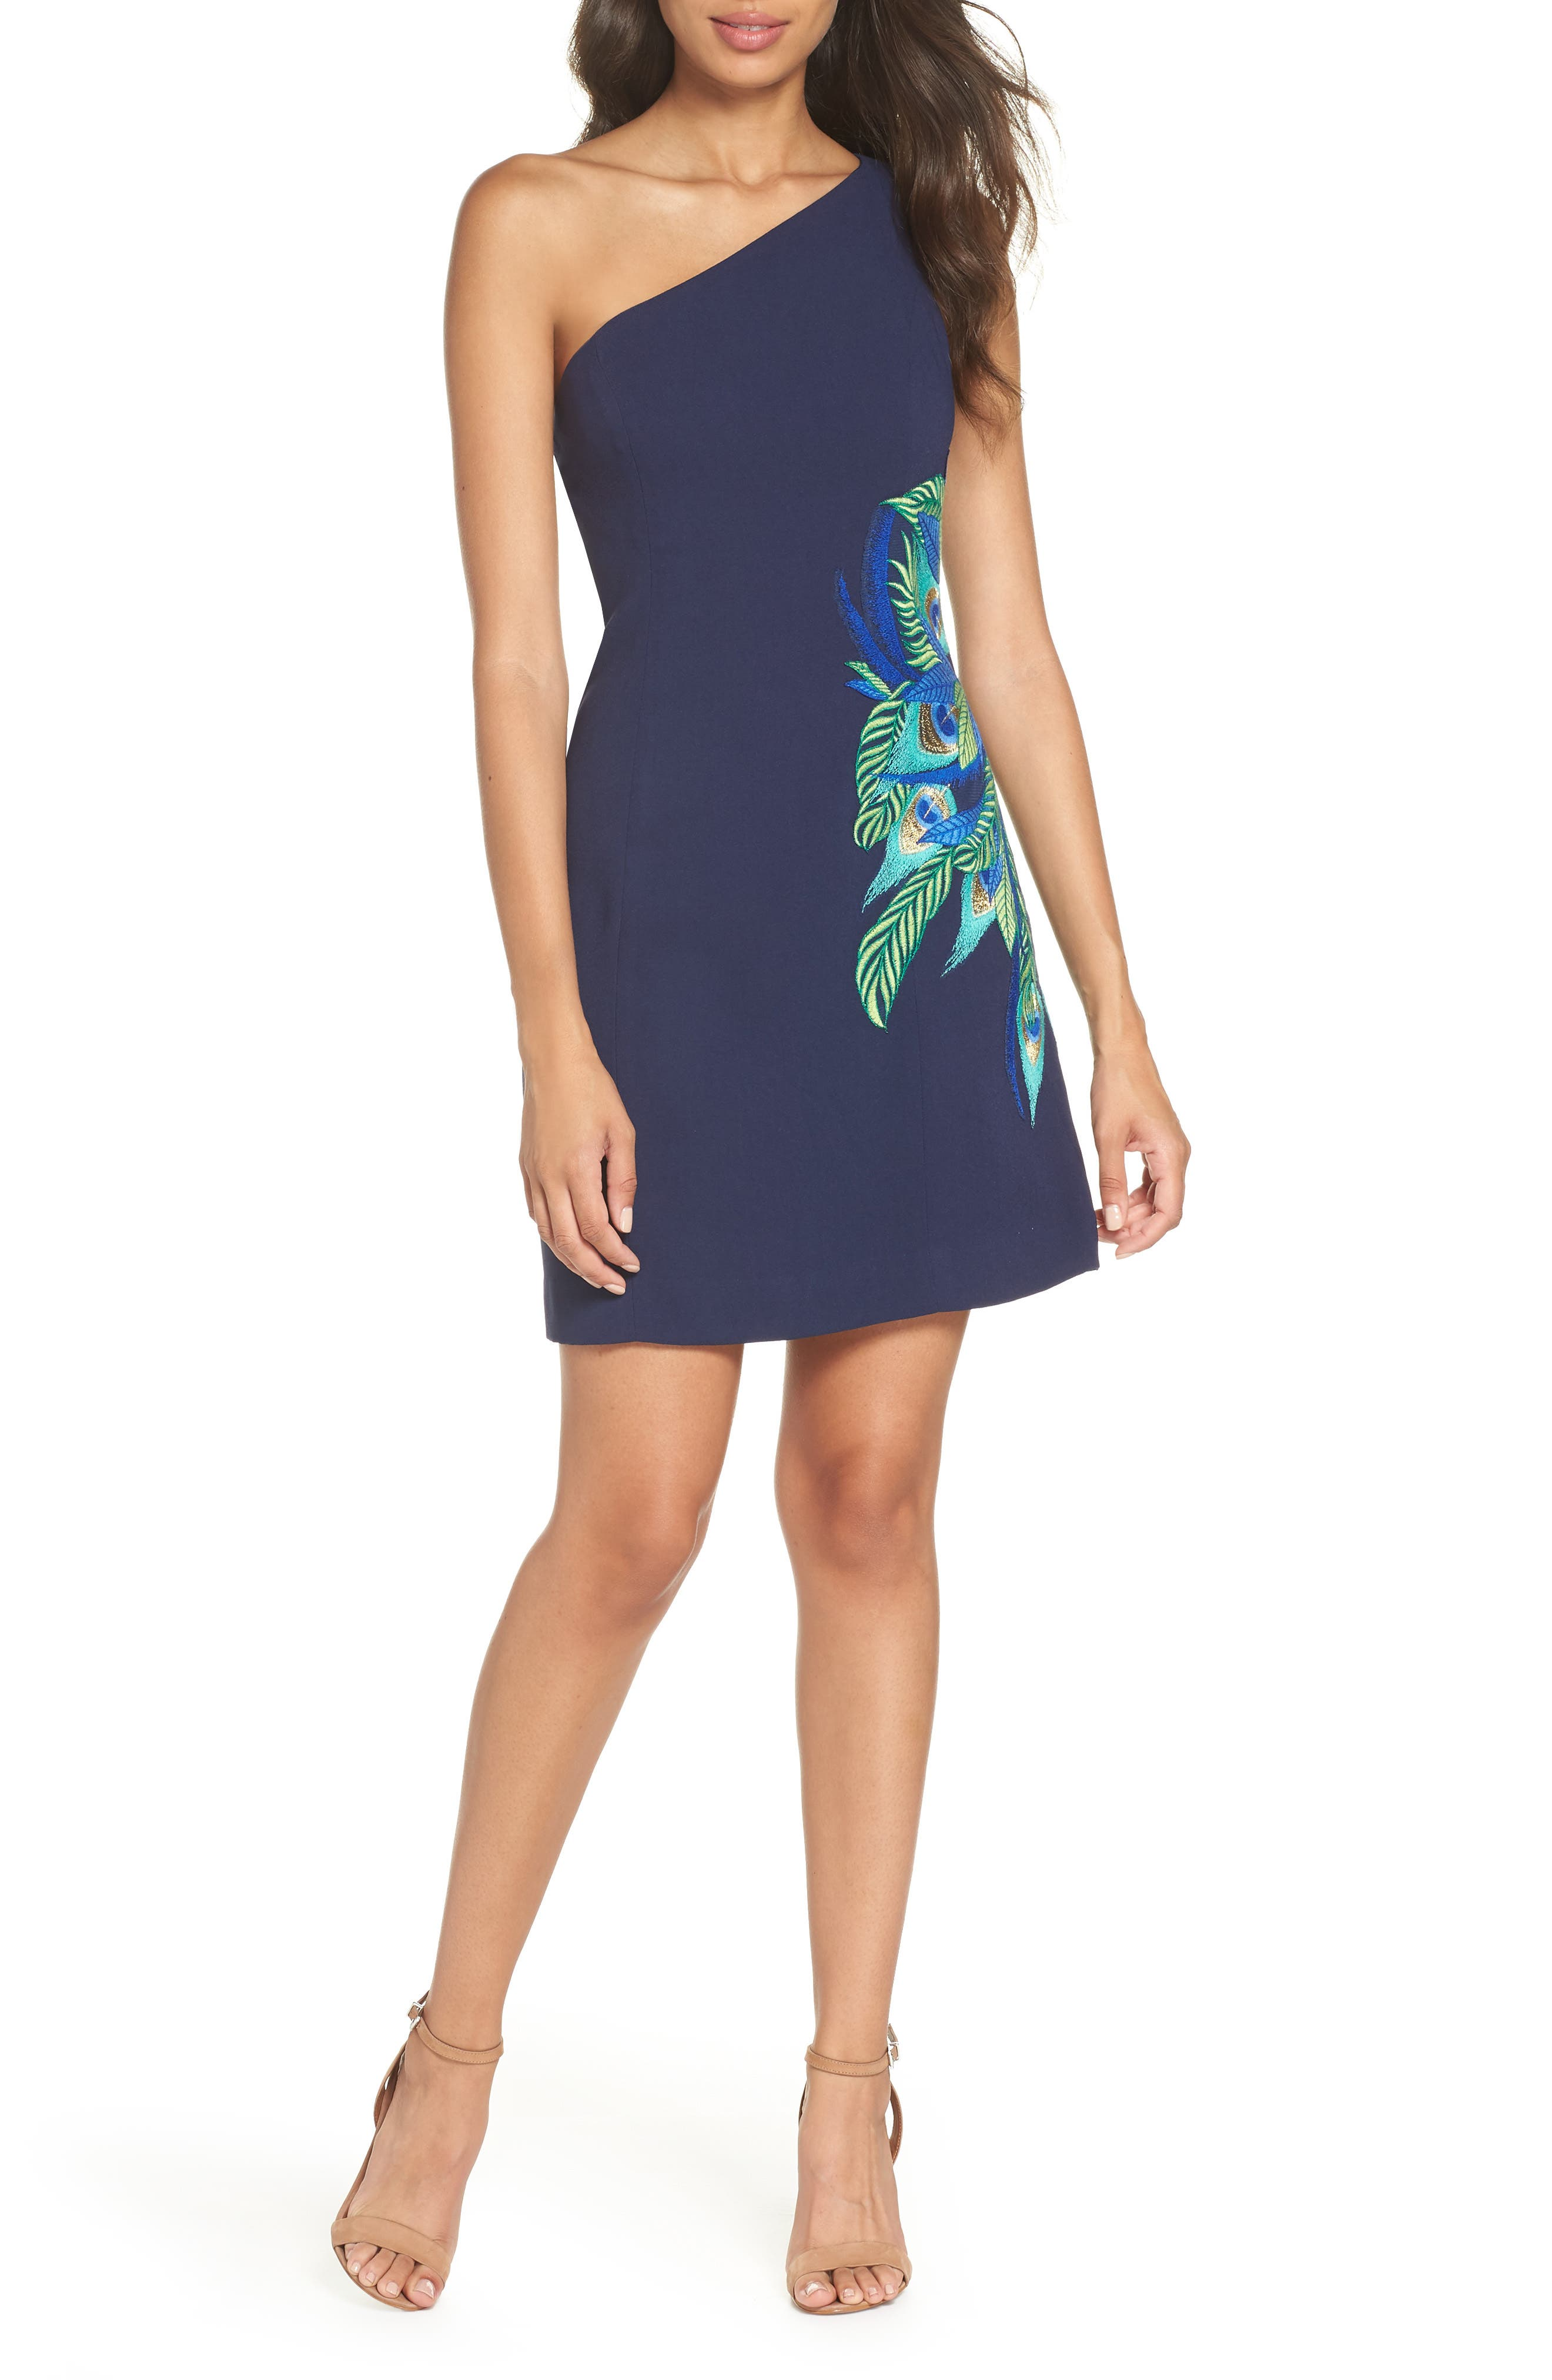 Lily Pulitzer<sup>®</sup> Jamie One-Shoulder Dress,                         Main,                         color, TRUE NAVY